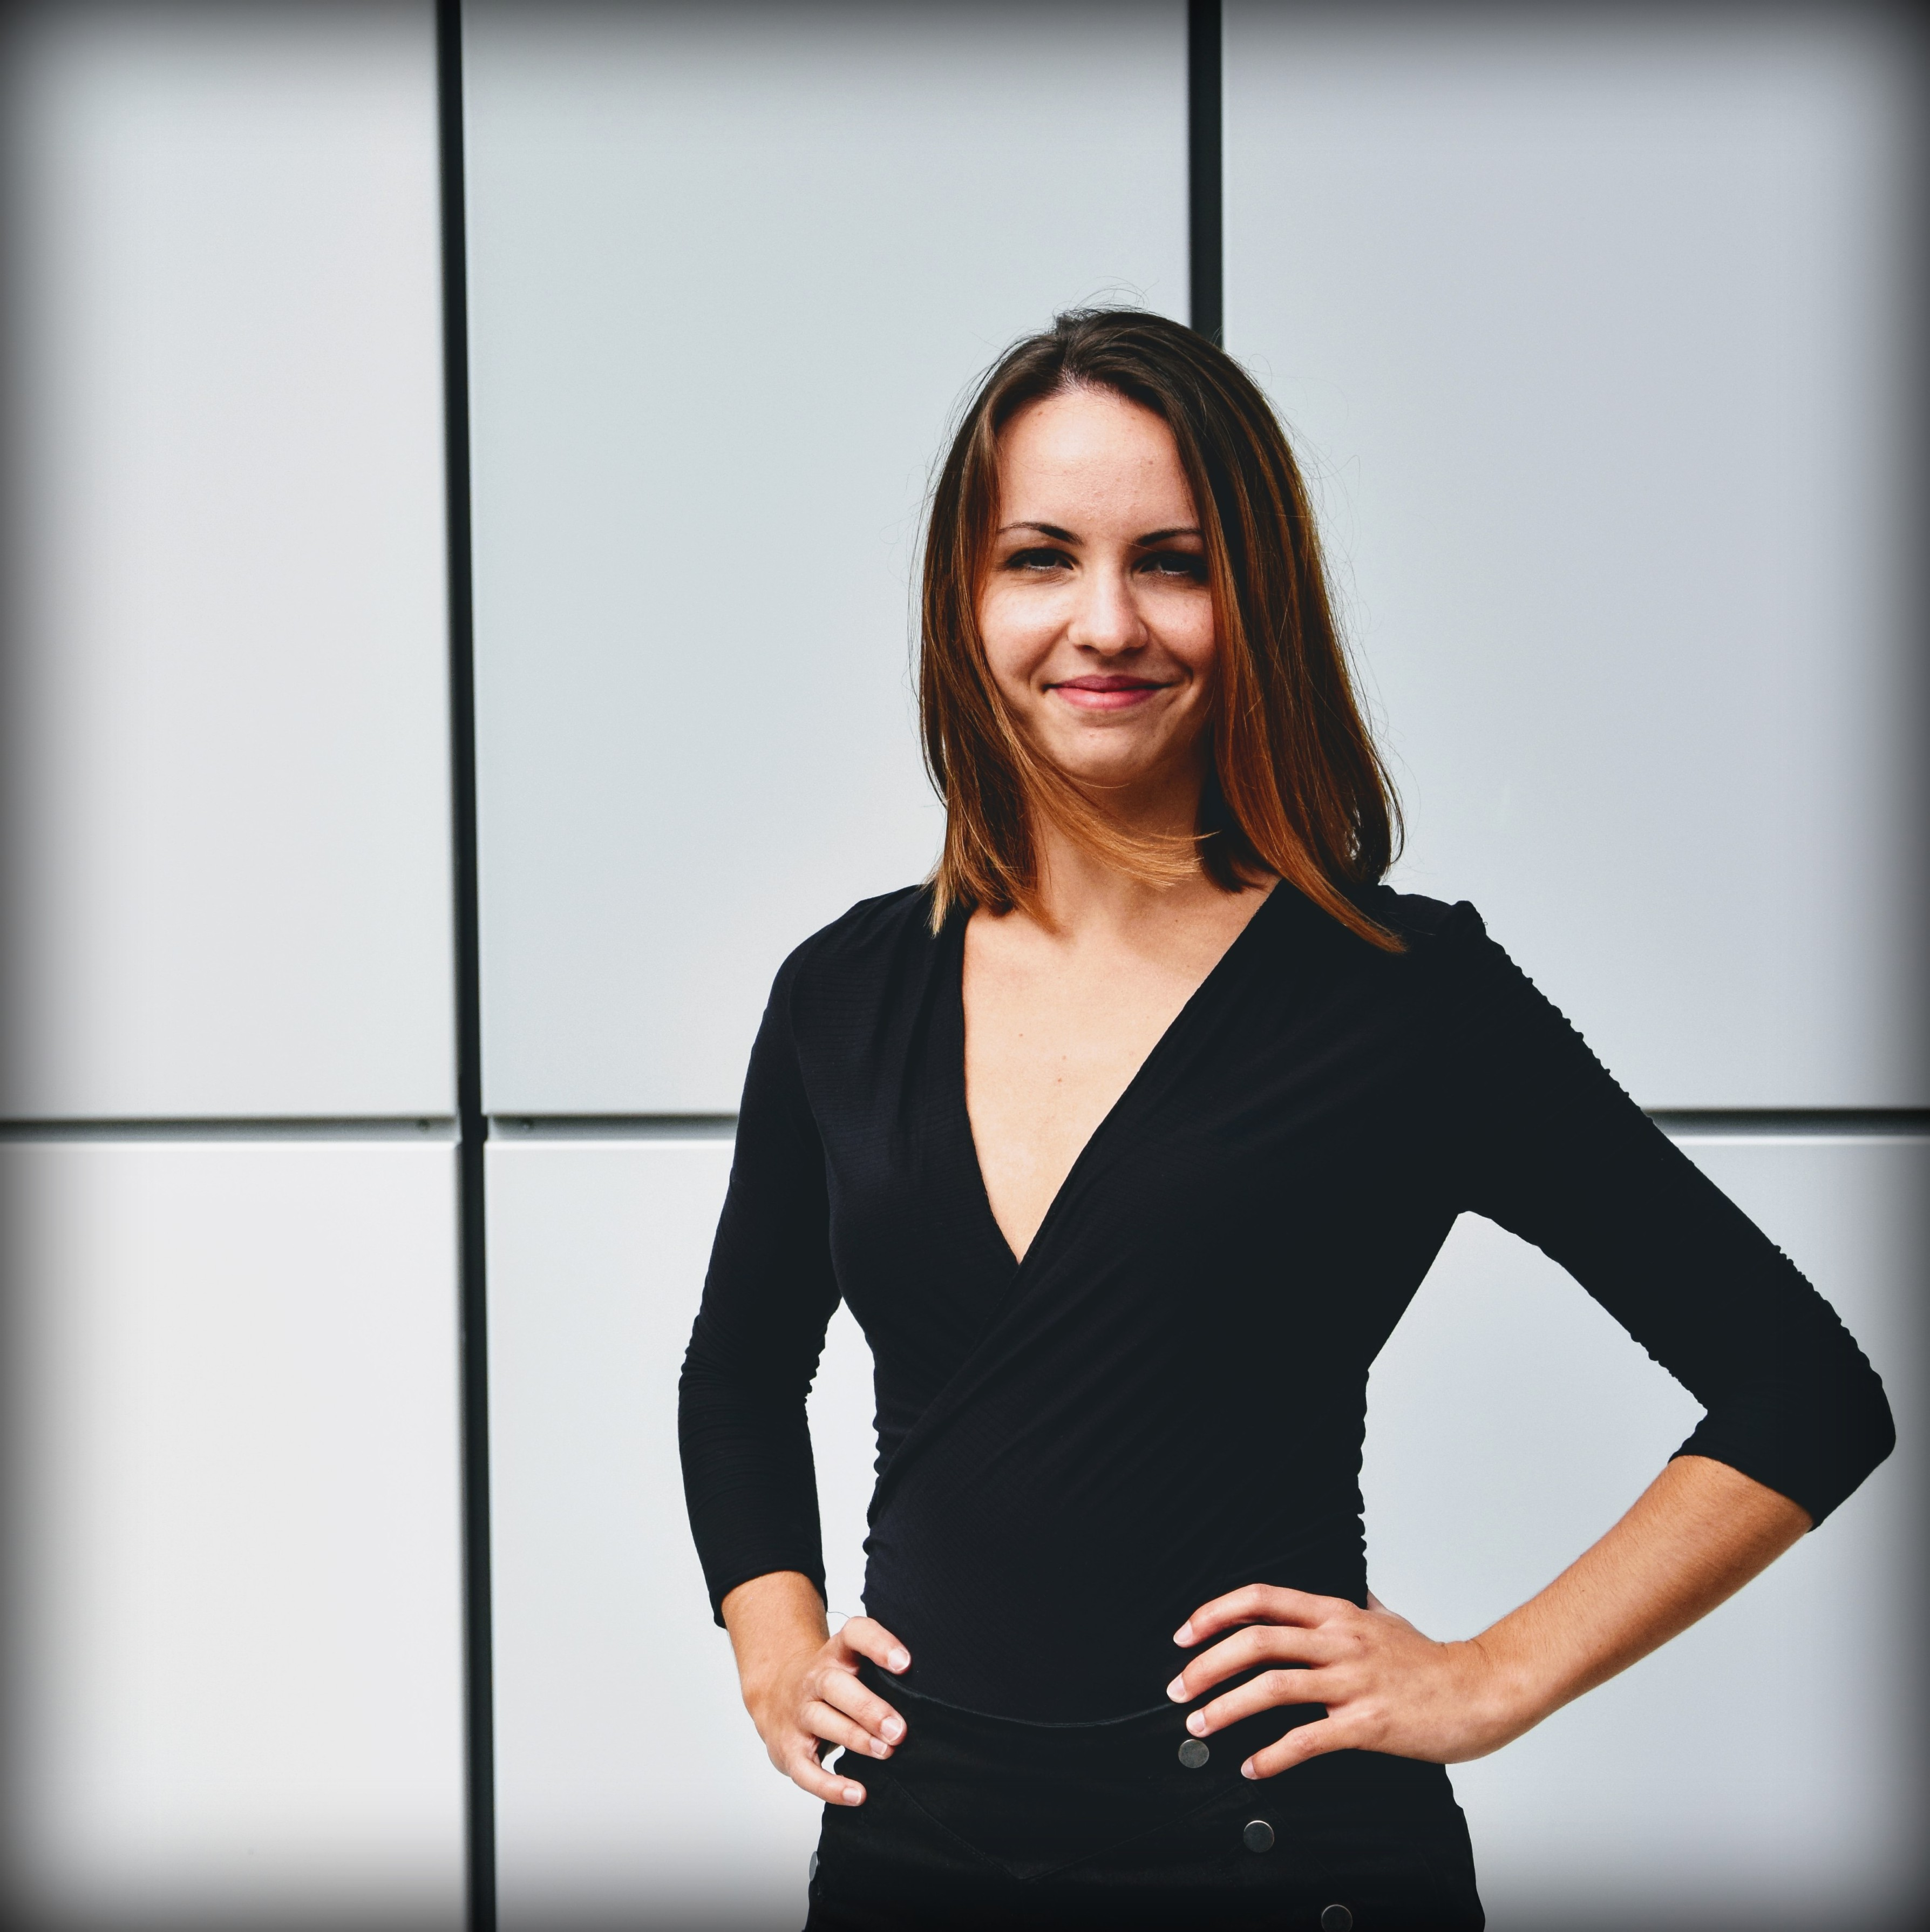 Valerie Untersweg